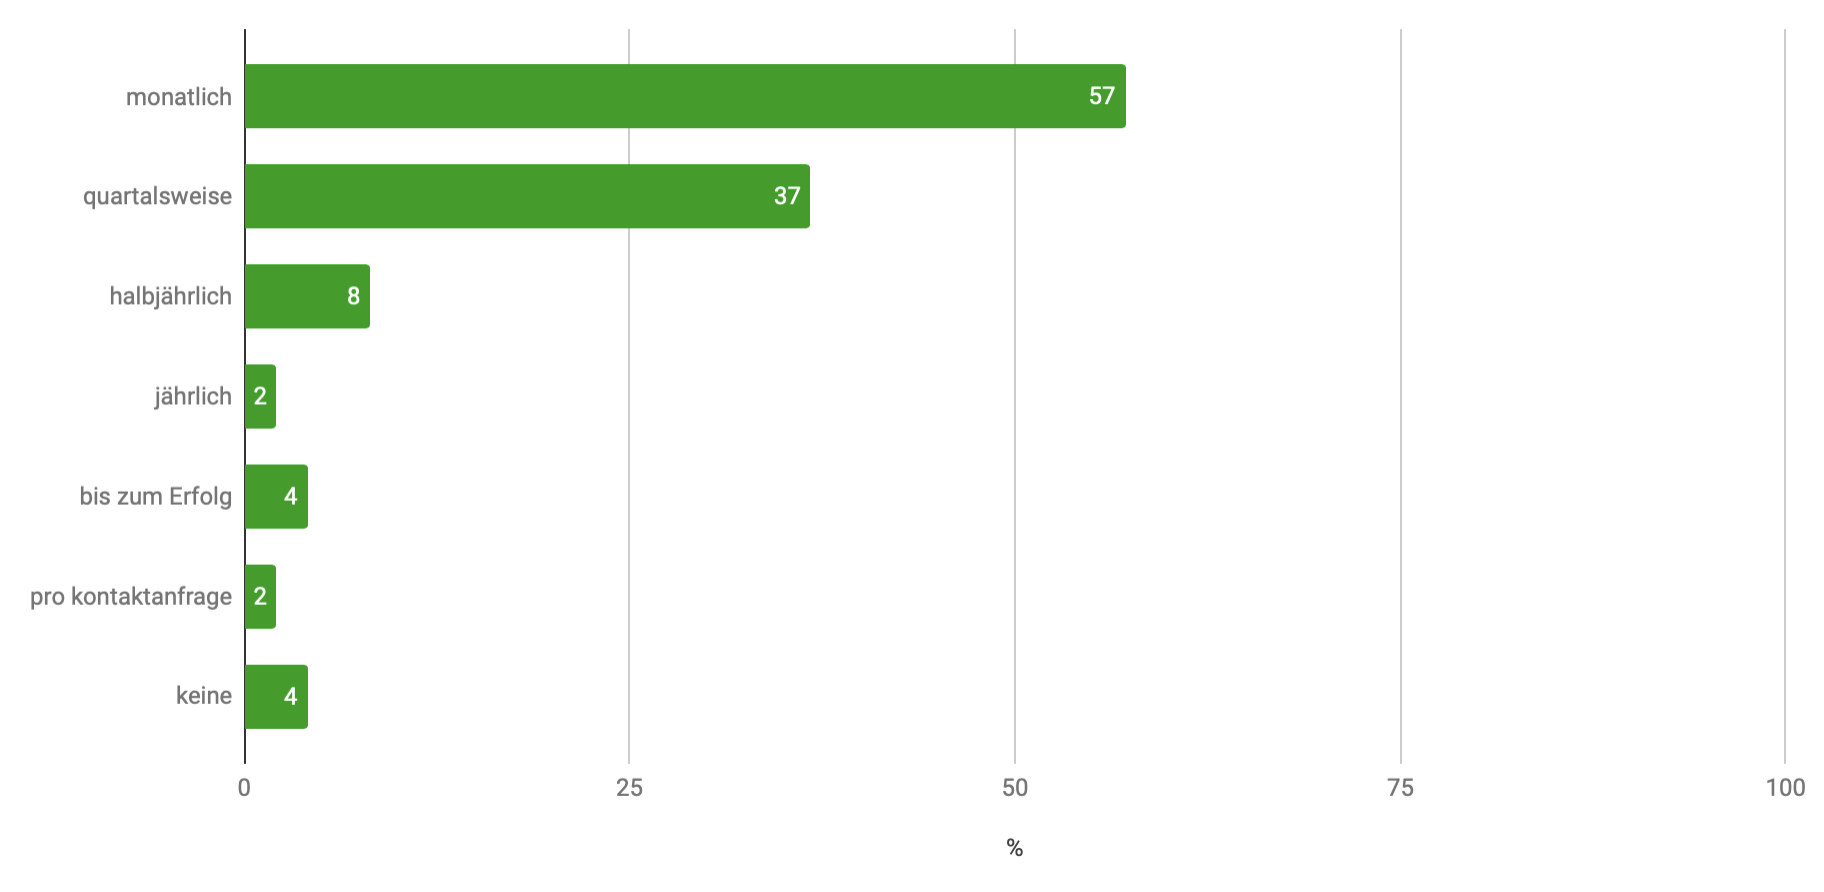 Gewünschte Vertragslaufzeiten in Prozent